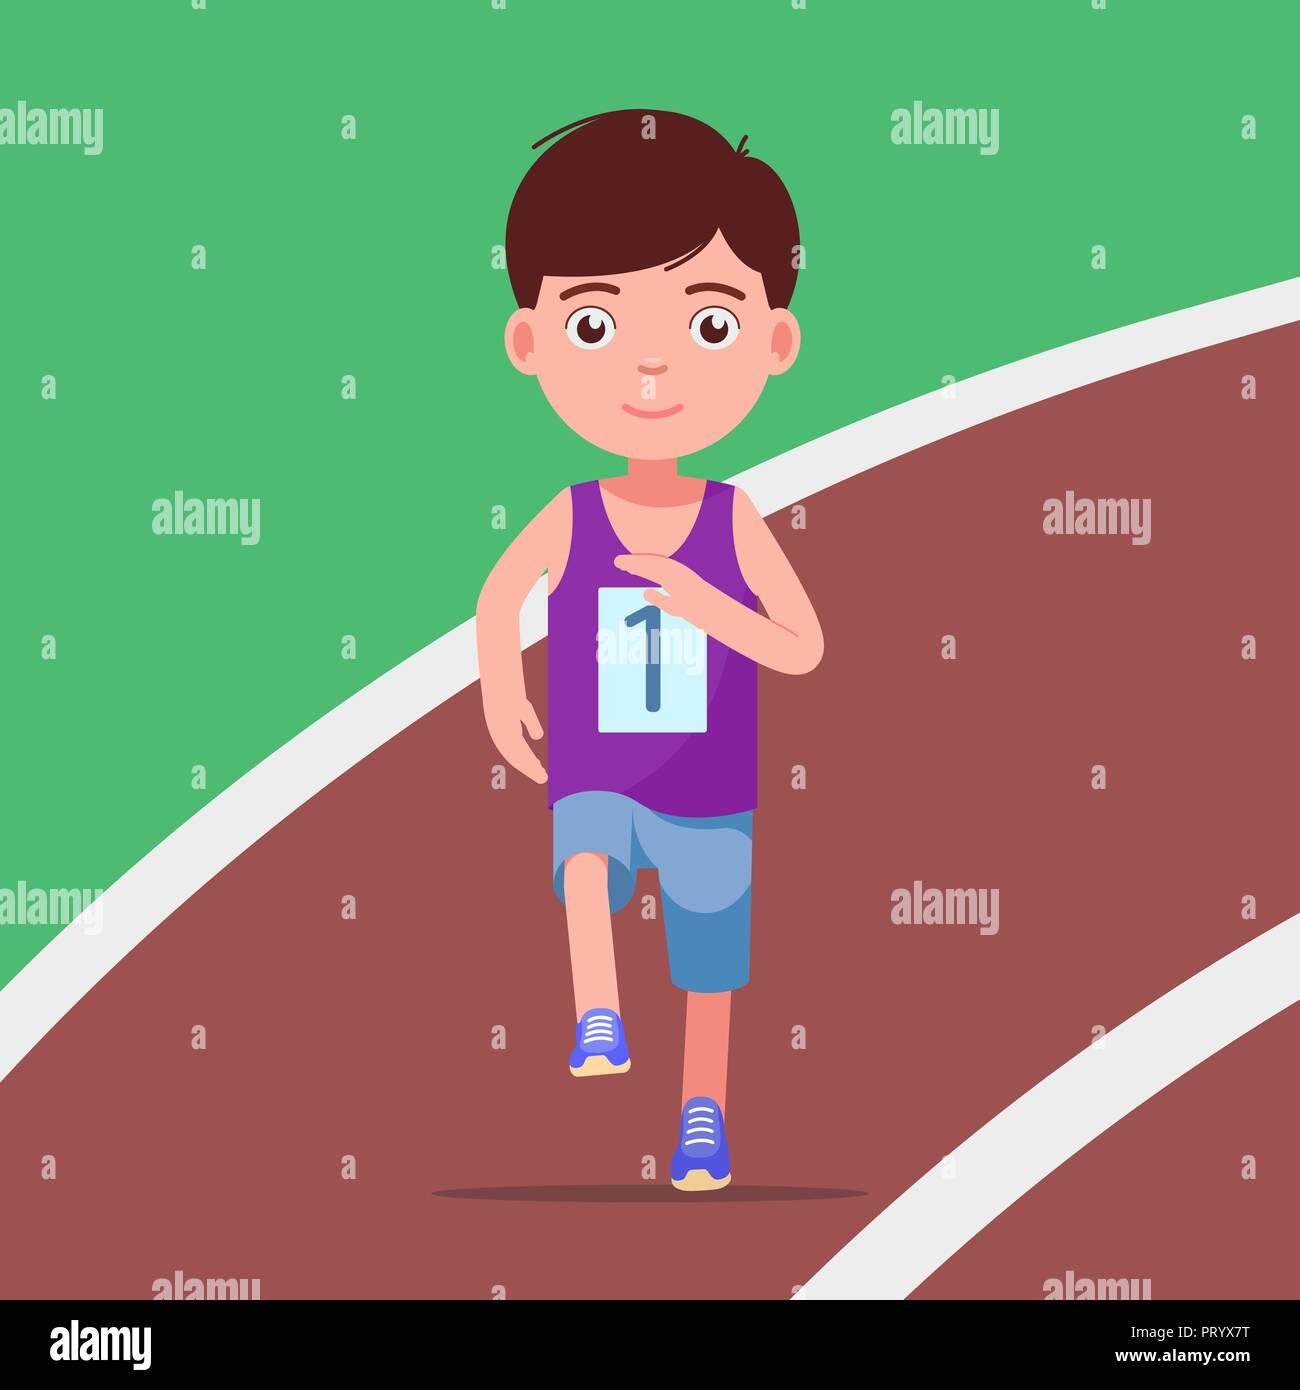 Cartoon boy running a marathon in a stadium - Stock Vector